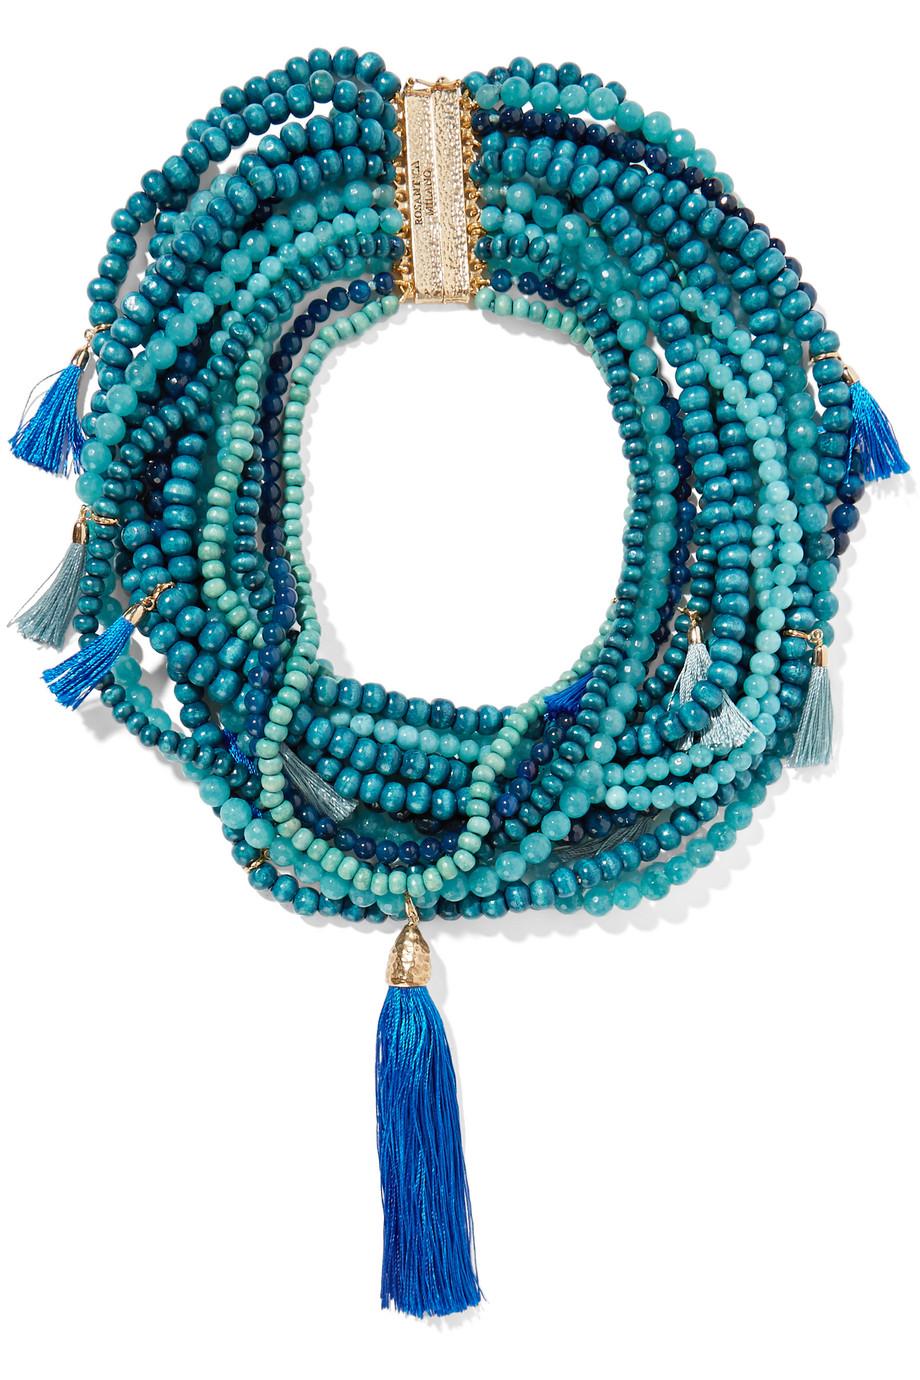 Rosantica Etna Gold-Tone, Quartz and Wood Necklace, Blue, Women's